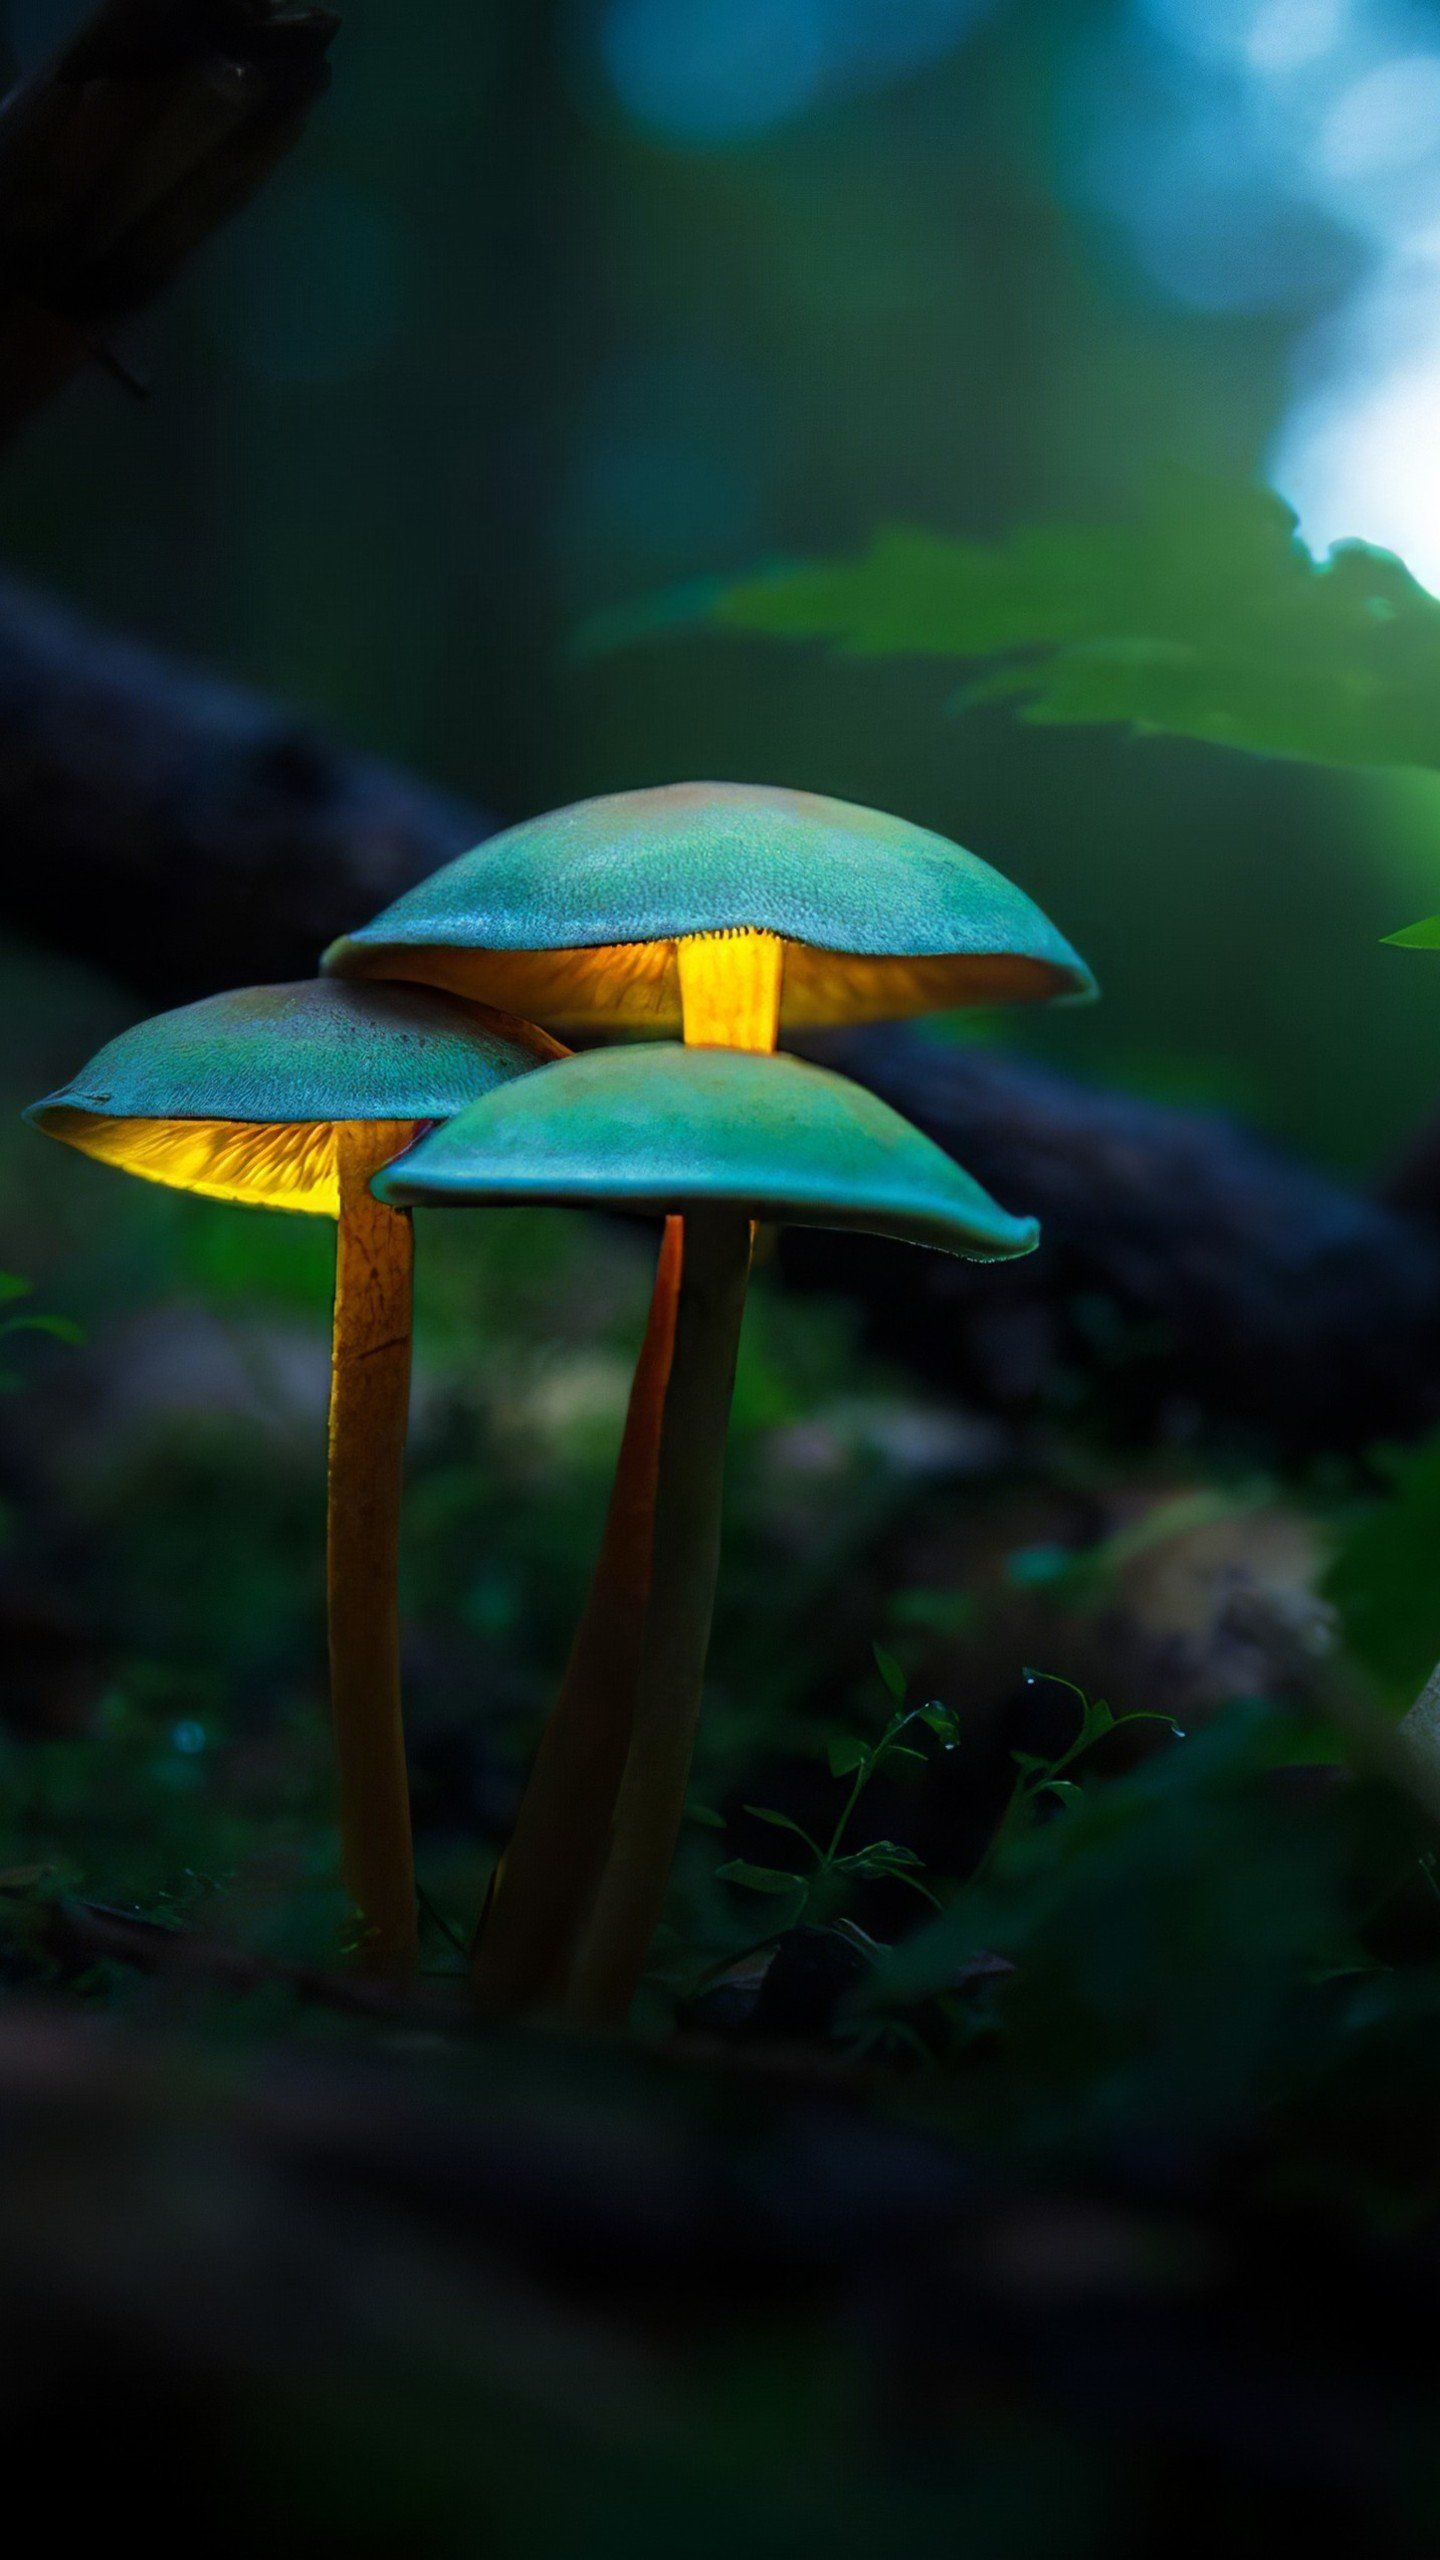 Mushroom Plants Glowing 4k Hd Artist Wallpapers Photos And Pictures Mushroom Plant Mushroom Wallpaper Wallpaper